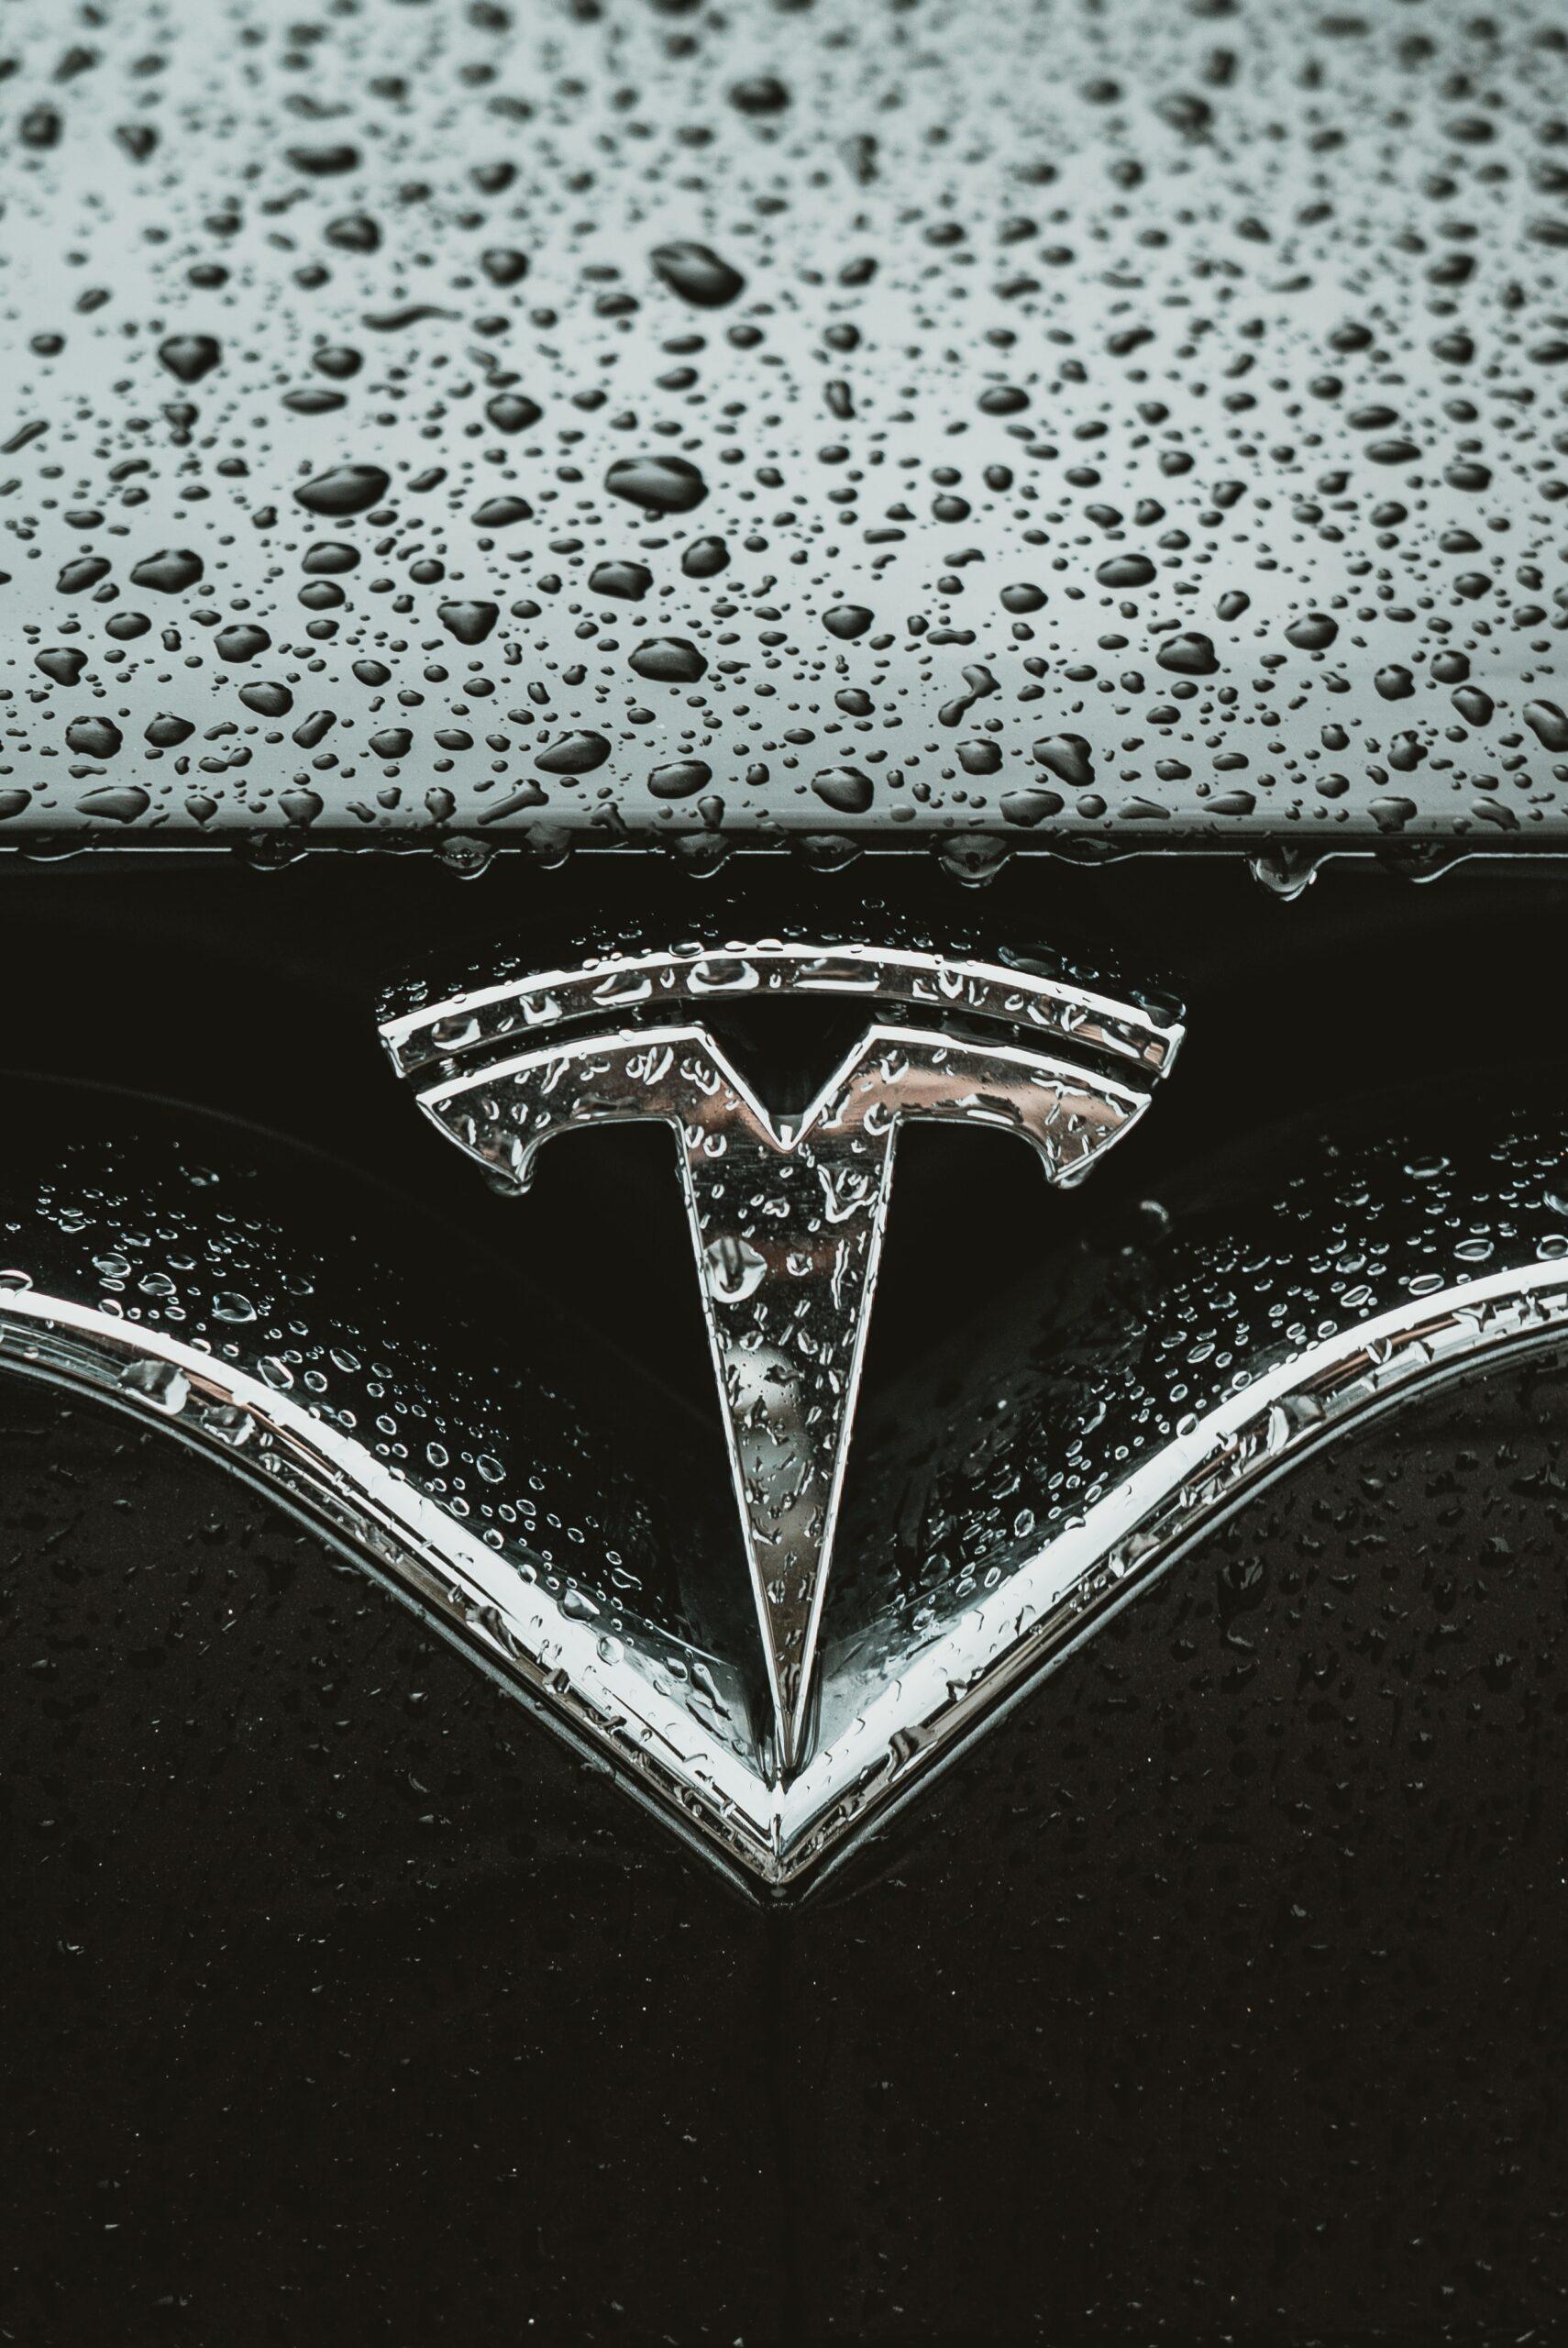 Tesla reported profit